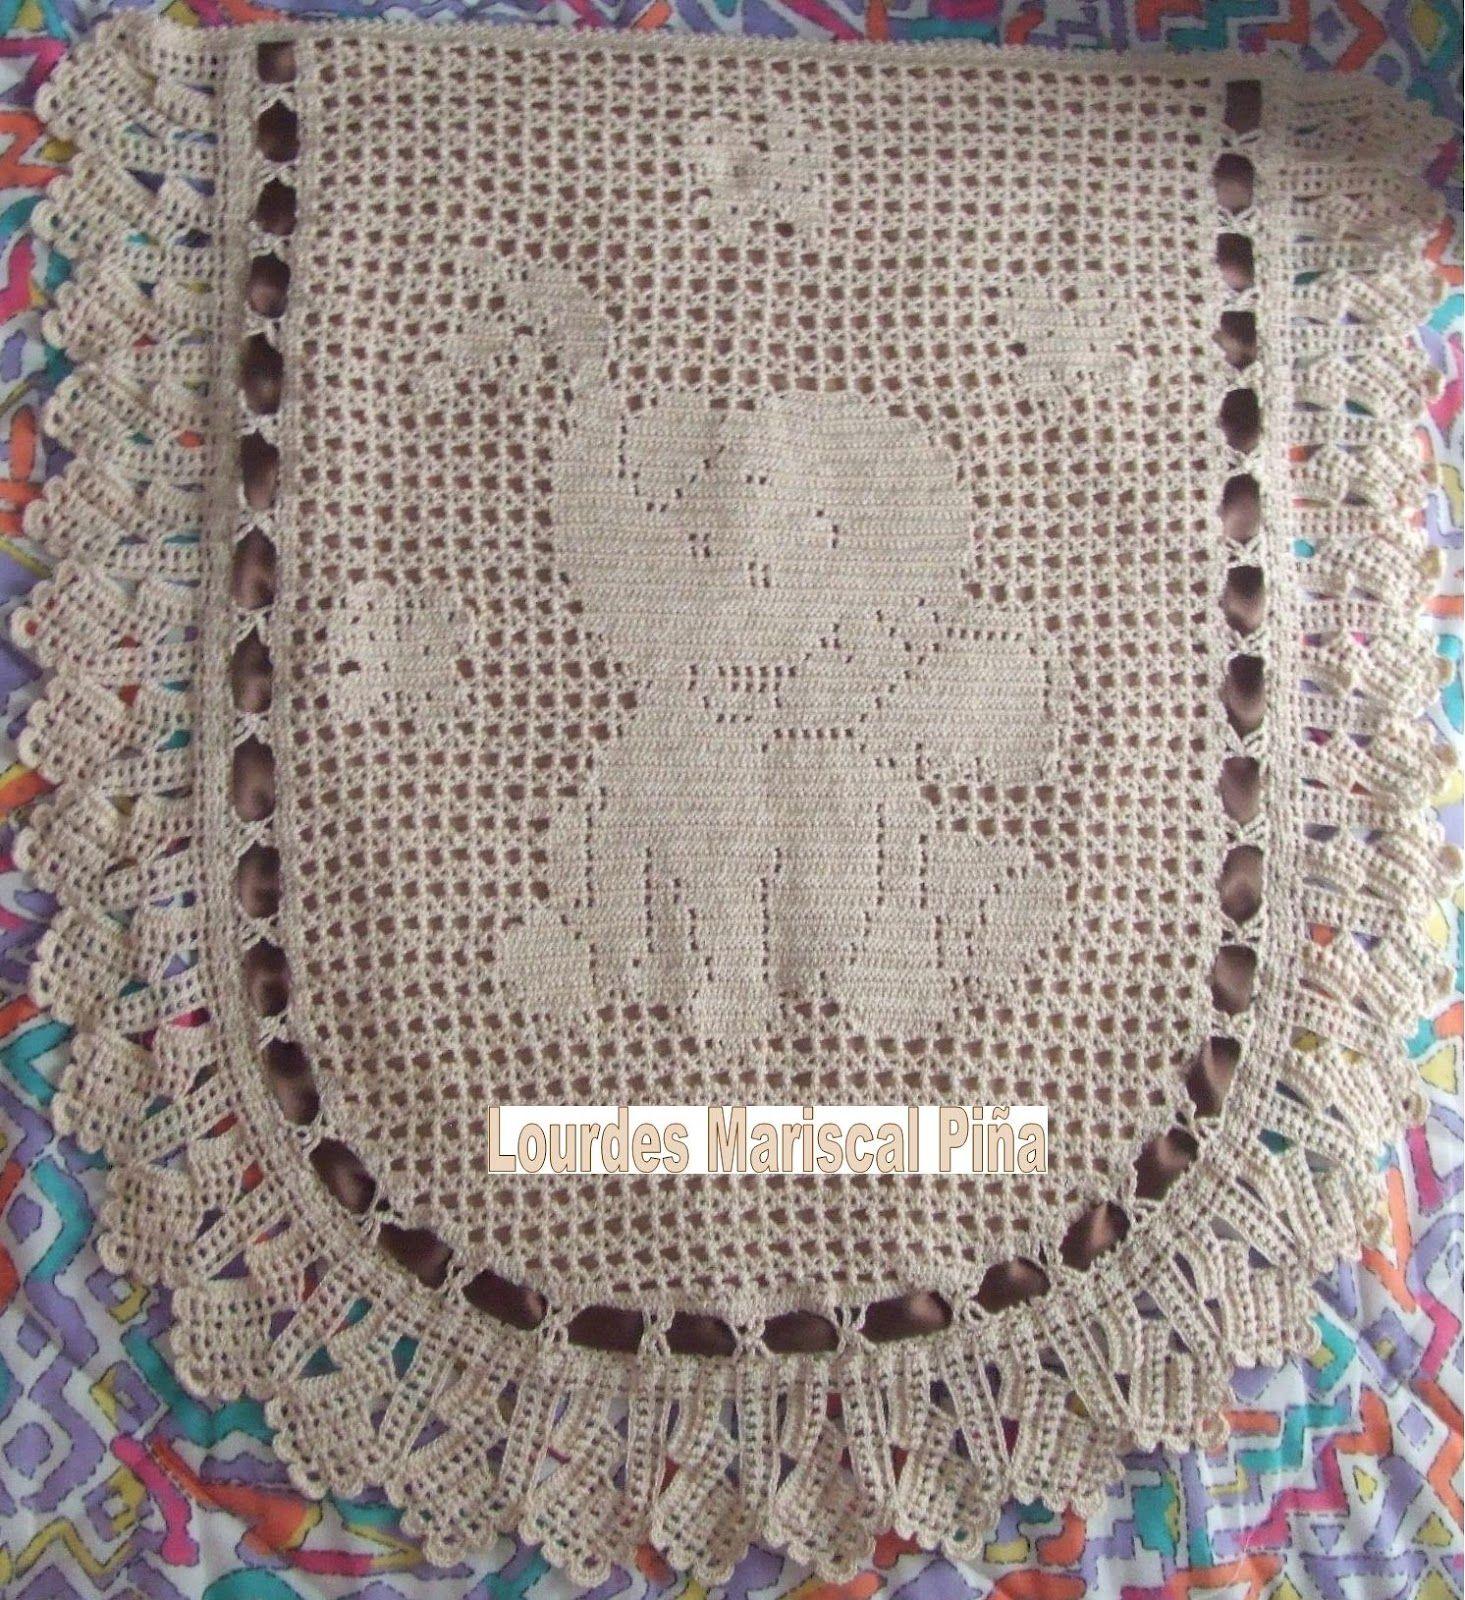 Colchas para carritos de beb en crochet imagui - Colchas a ganchillo muestras ...